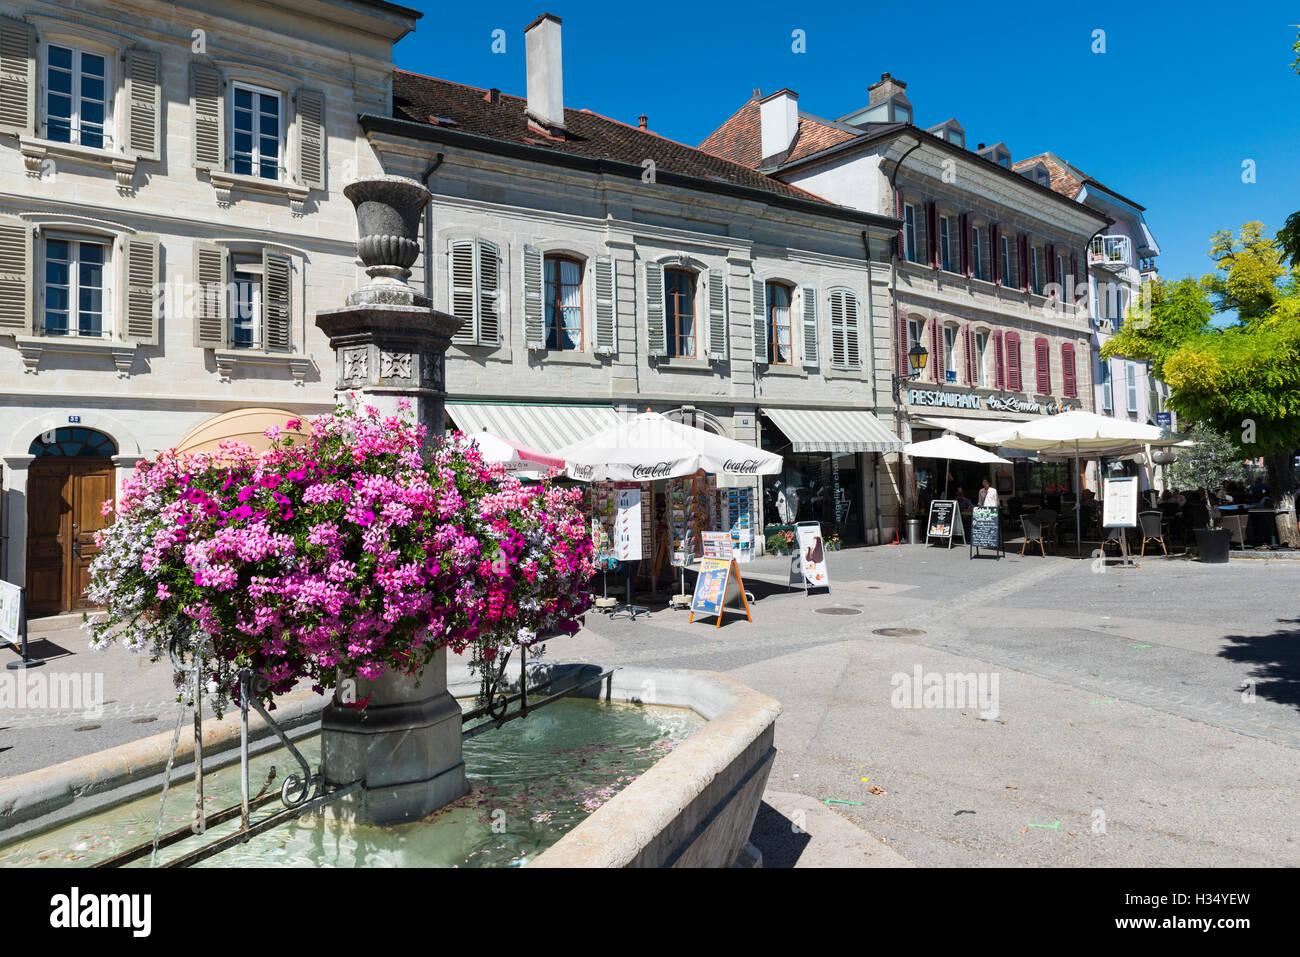 Fountain with flowers, Rue de Rive, Nyon, canton Vaud, Switzerland - Stock Image